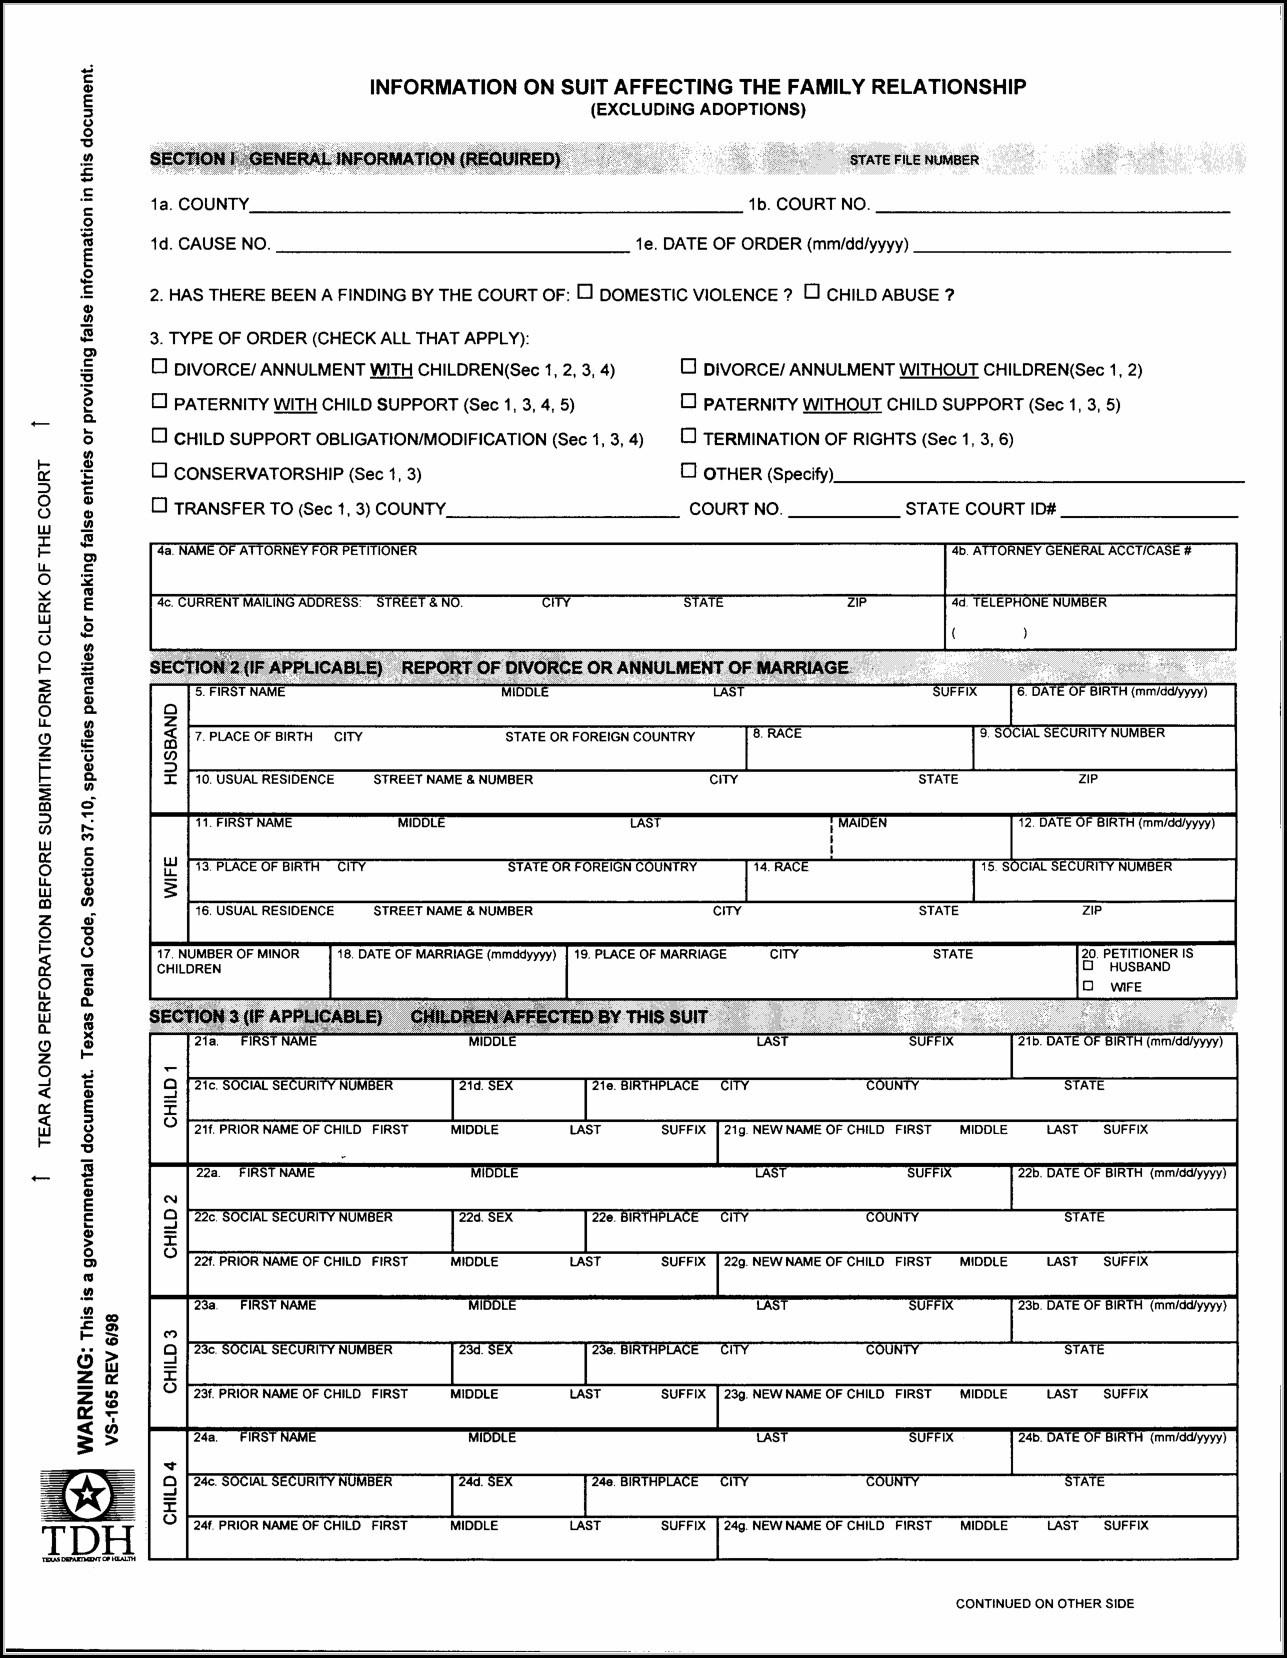 Free Printable Divorce Forms Texas - Form : Resume Examples #n48Mzeb1Yz - Free Printable Divorce Forms Texas